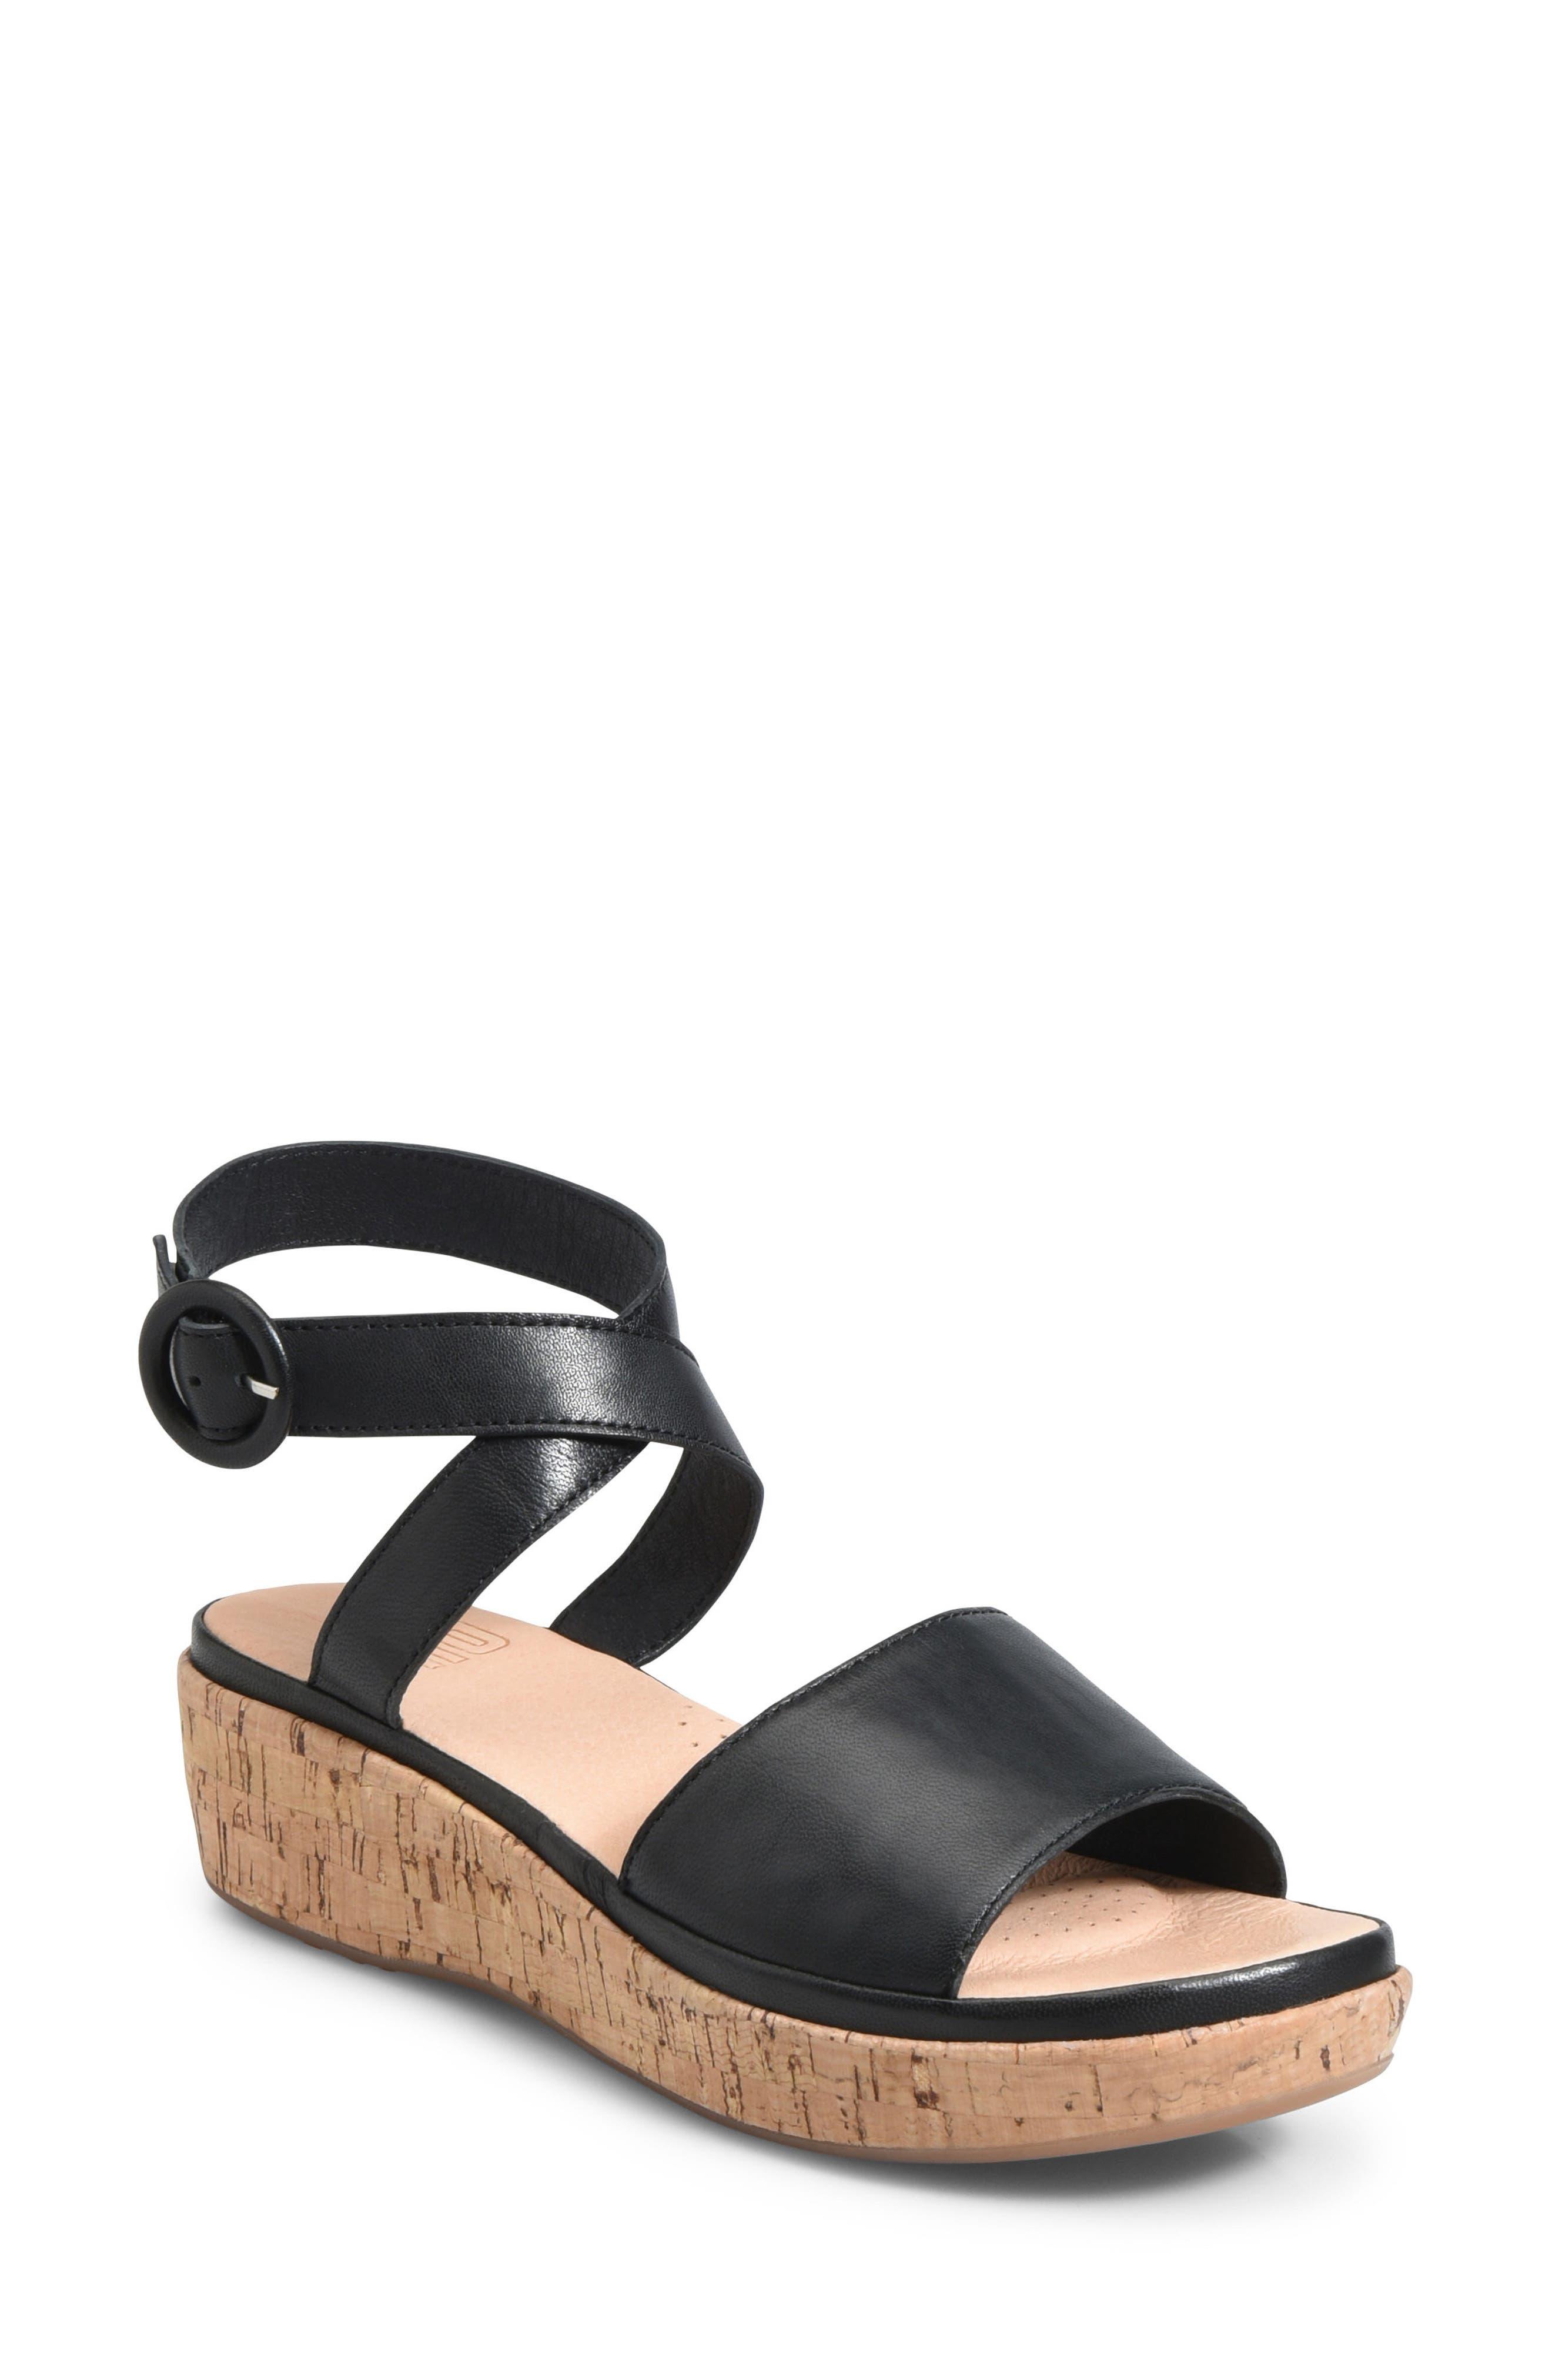 Dreamy Platform Wedge Sandal,                             Main thumbnail 1, color,                             Black Leather